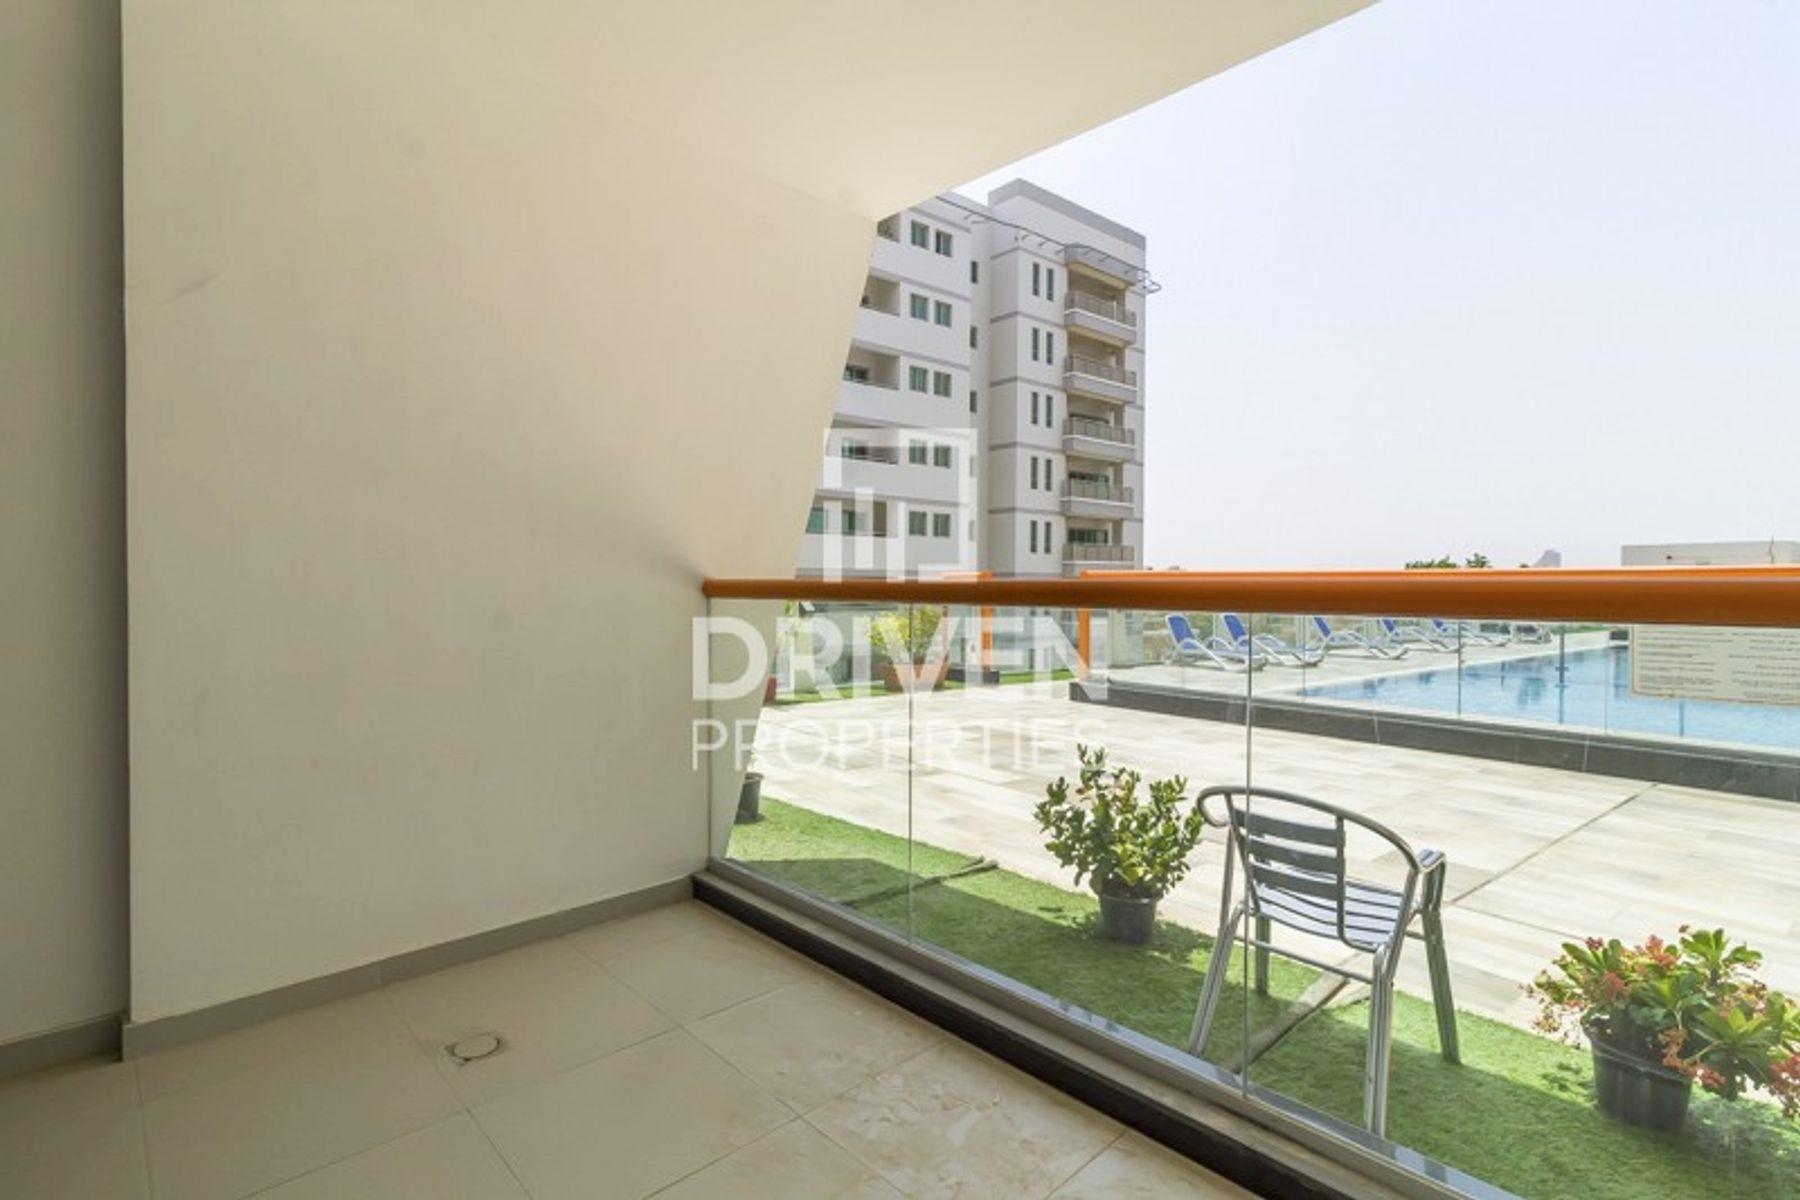 Apartment for Rent in Binghatti Diamonds - Dubai Silicon Oasis